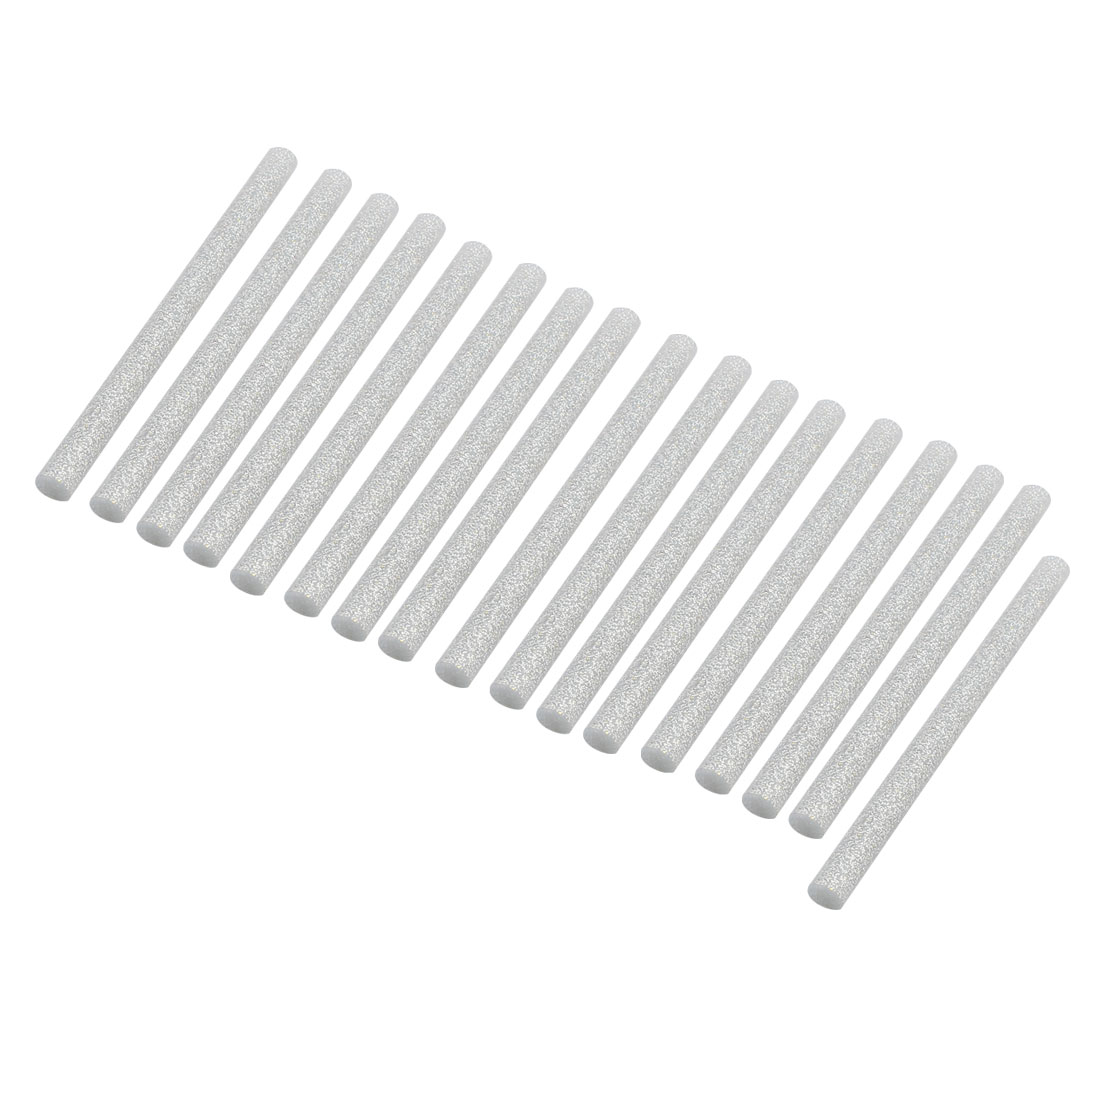 17pcs 7mm x 100mm Hot Melt Glue Sticks Silver Tone for DIY Small Craft Projects - image 3 de 3